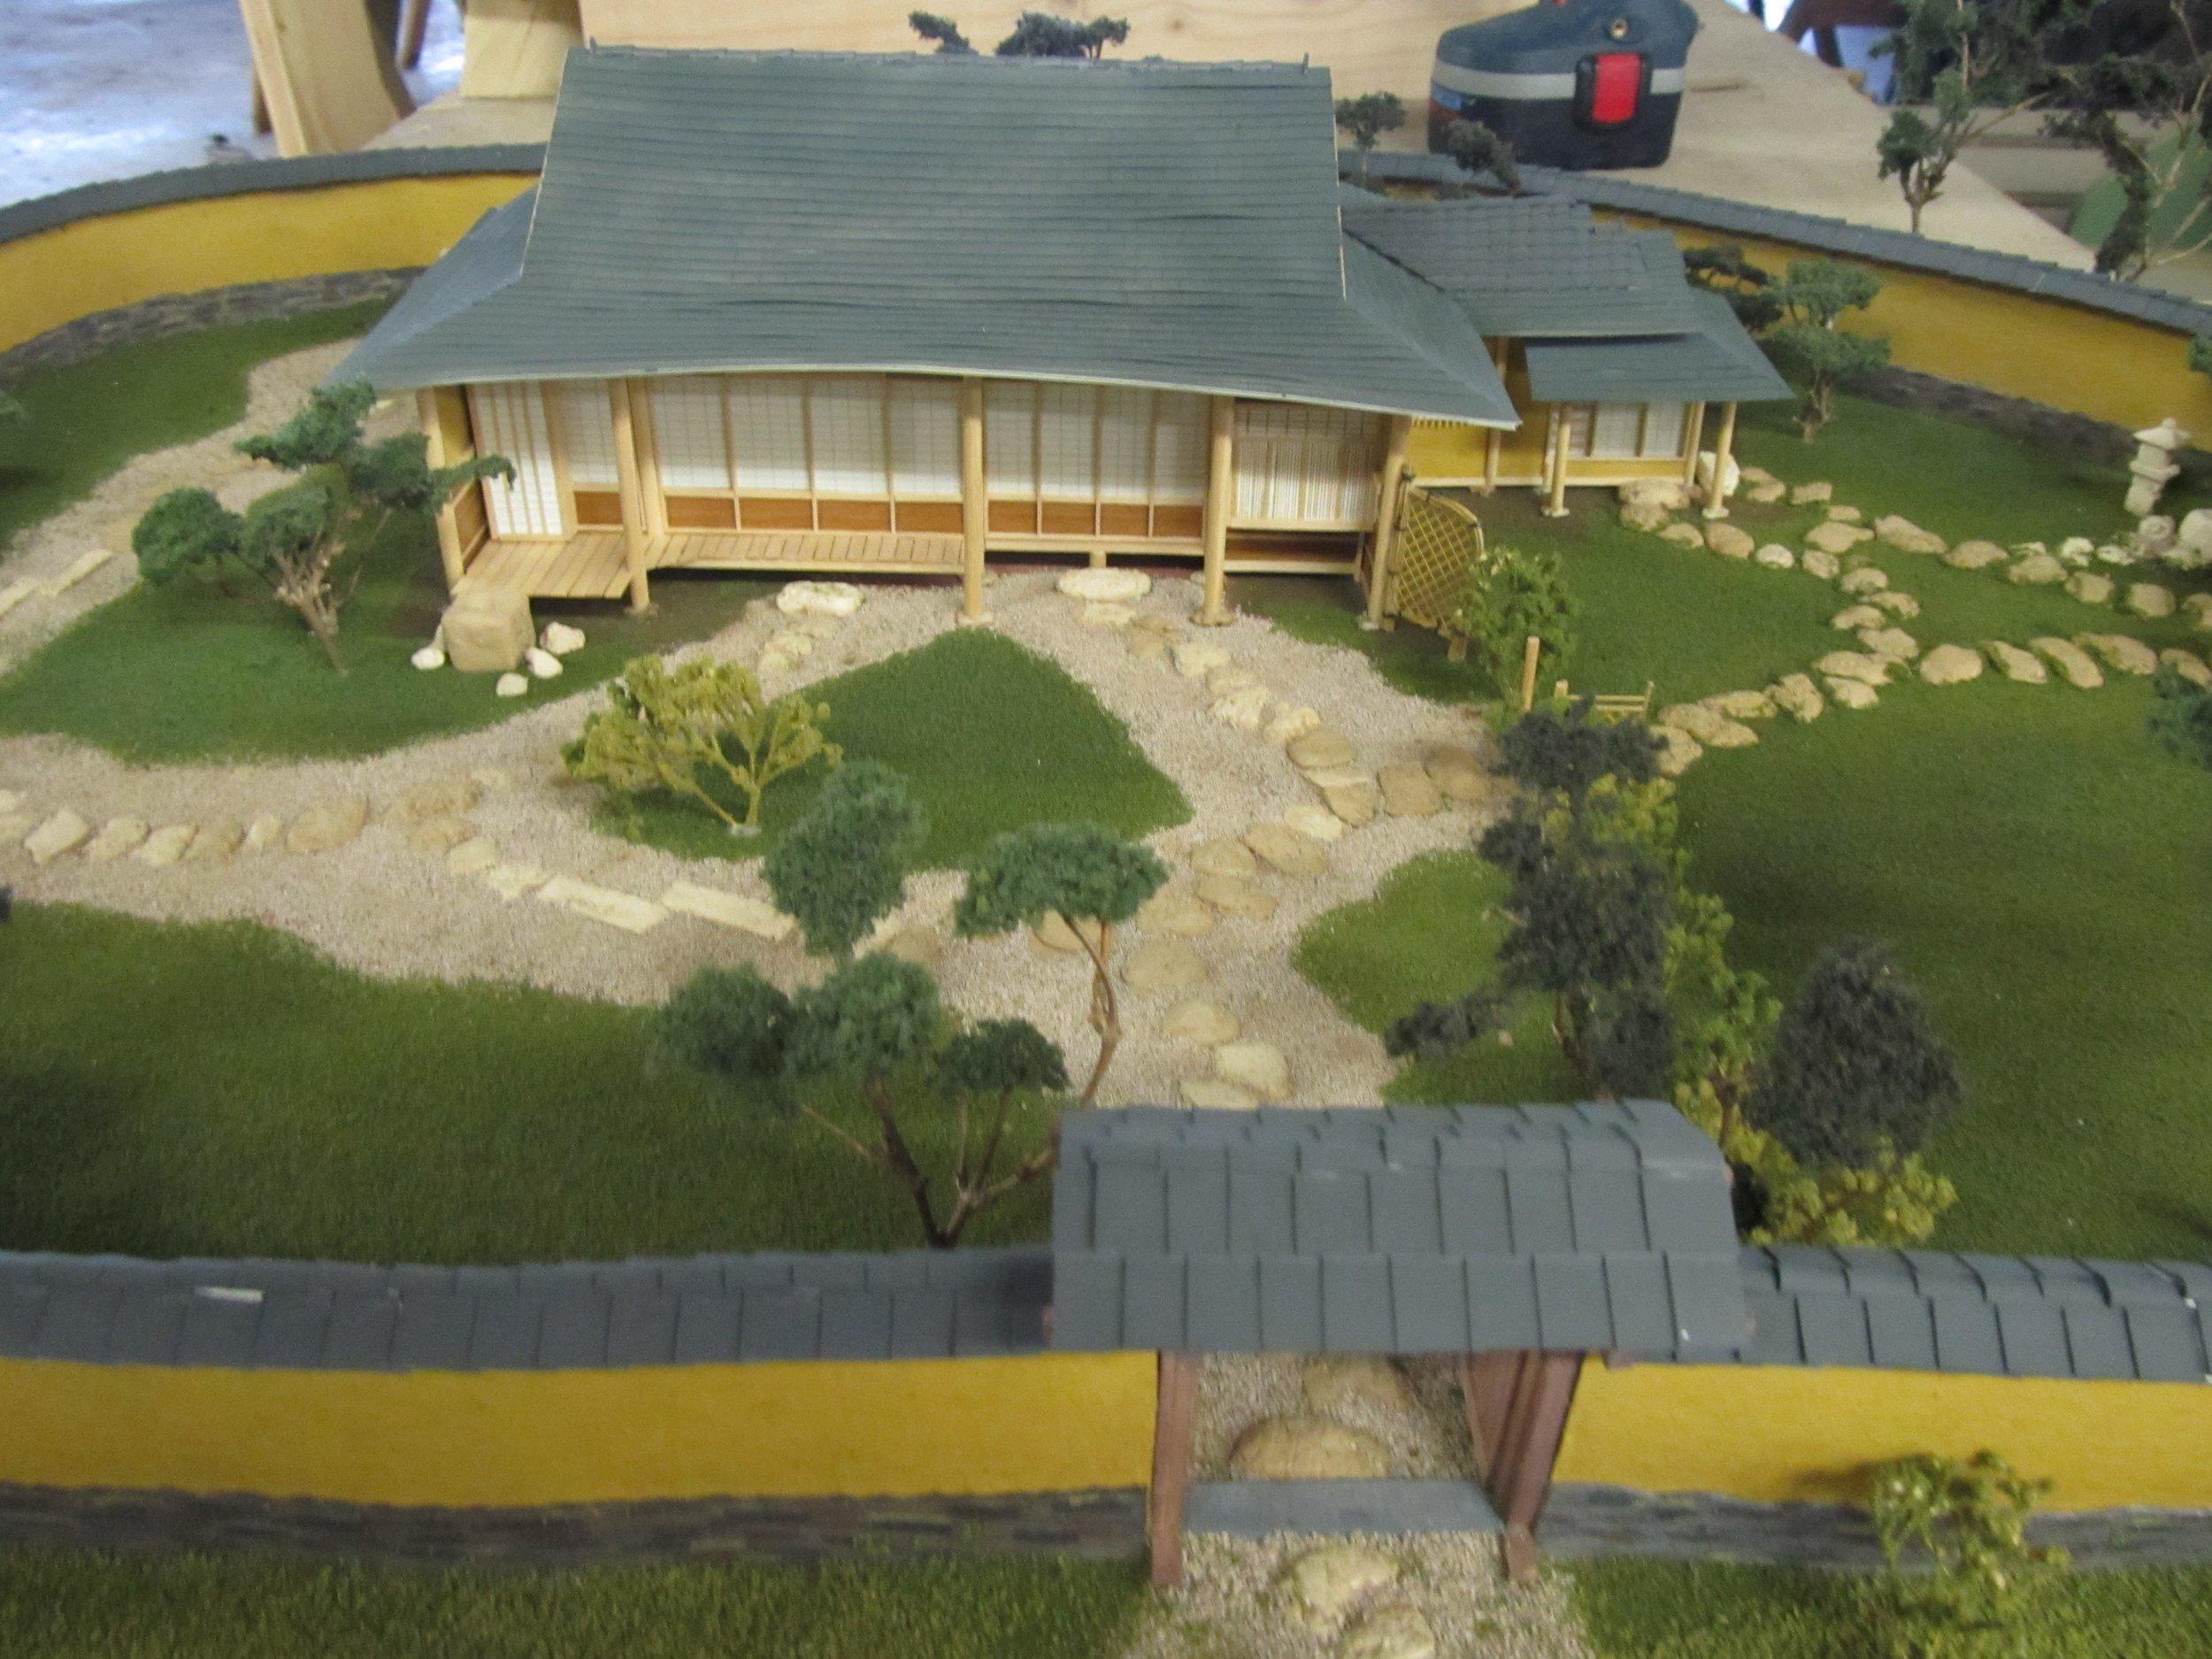 Model of Teahouse restoration